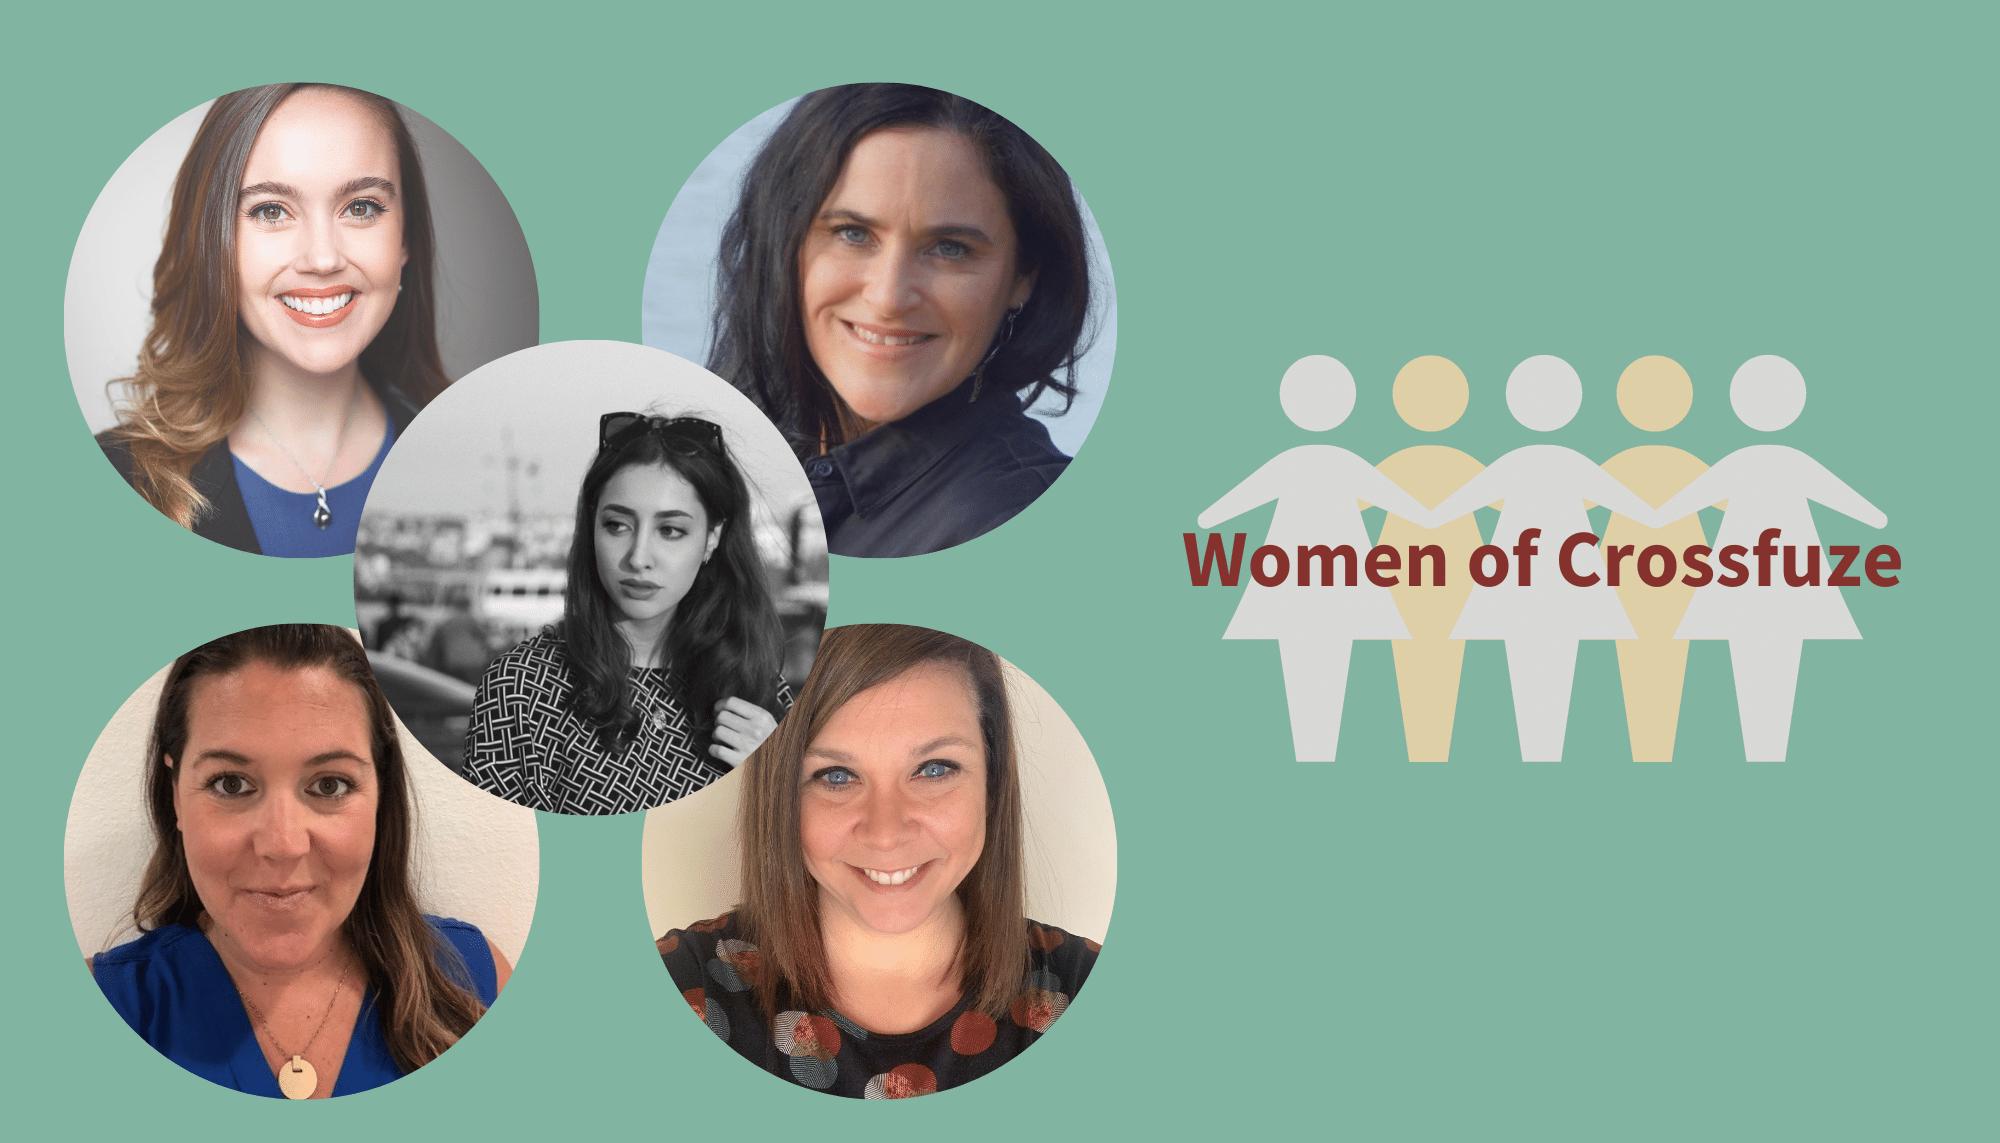 Meet the Women of Crossfuze